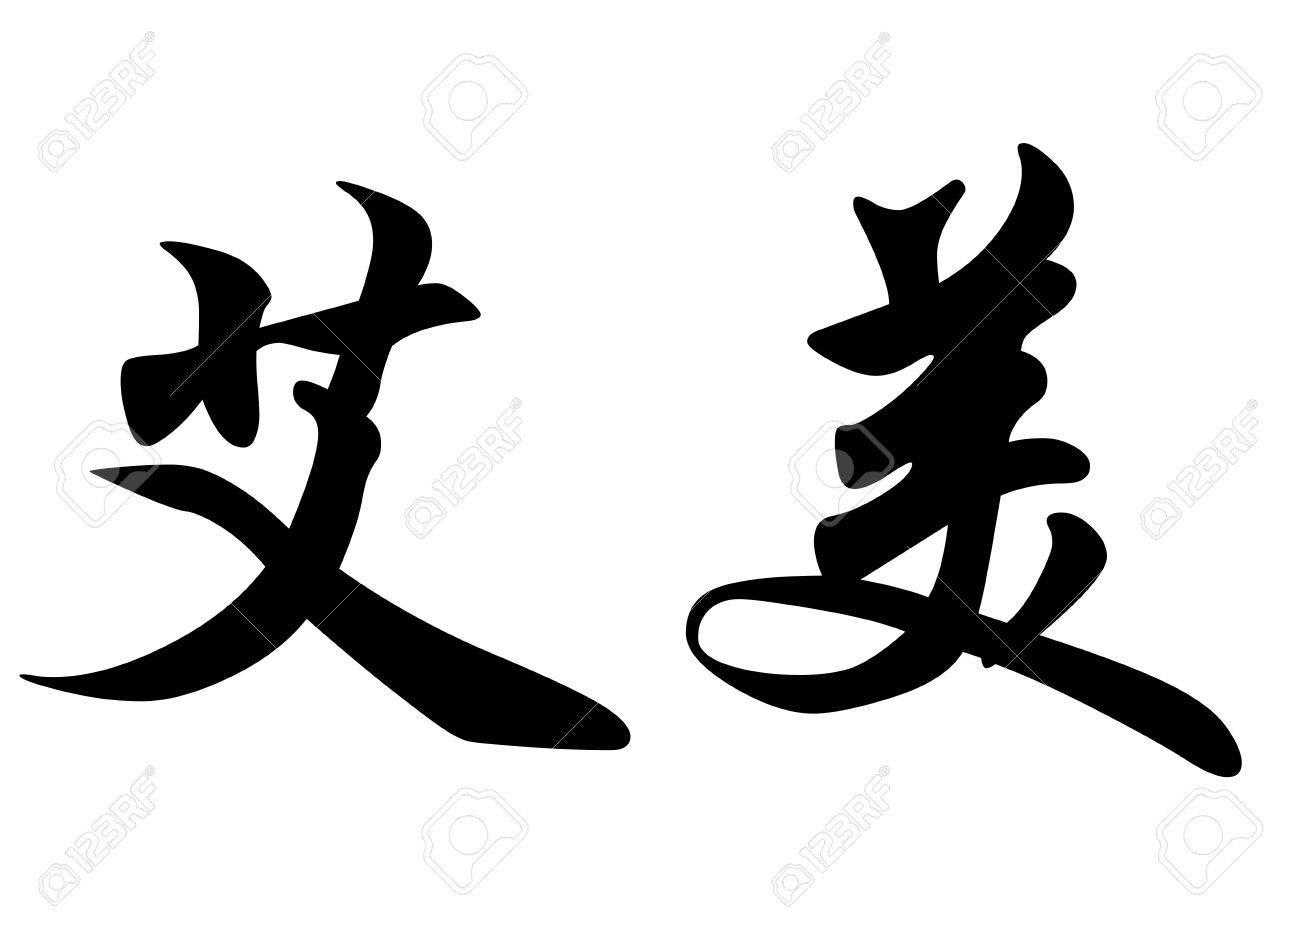 English name amy in chinese kanji calligraphy characters or japanese english name amy in chinese kanji calligraphy characters or japanese characters stock photo 36350635 biocorpaavc Choice Image